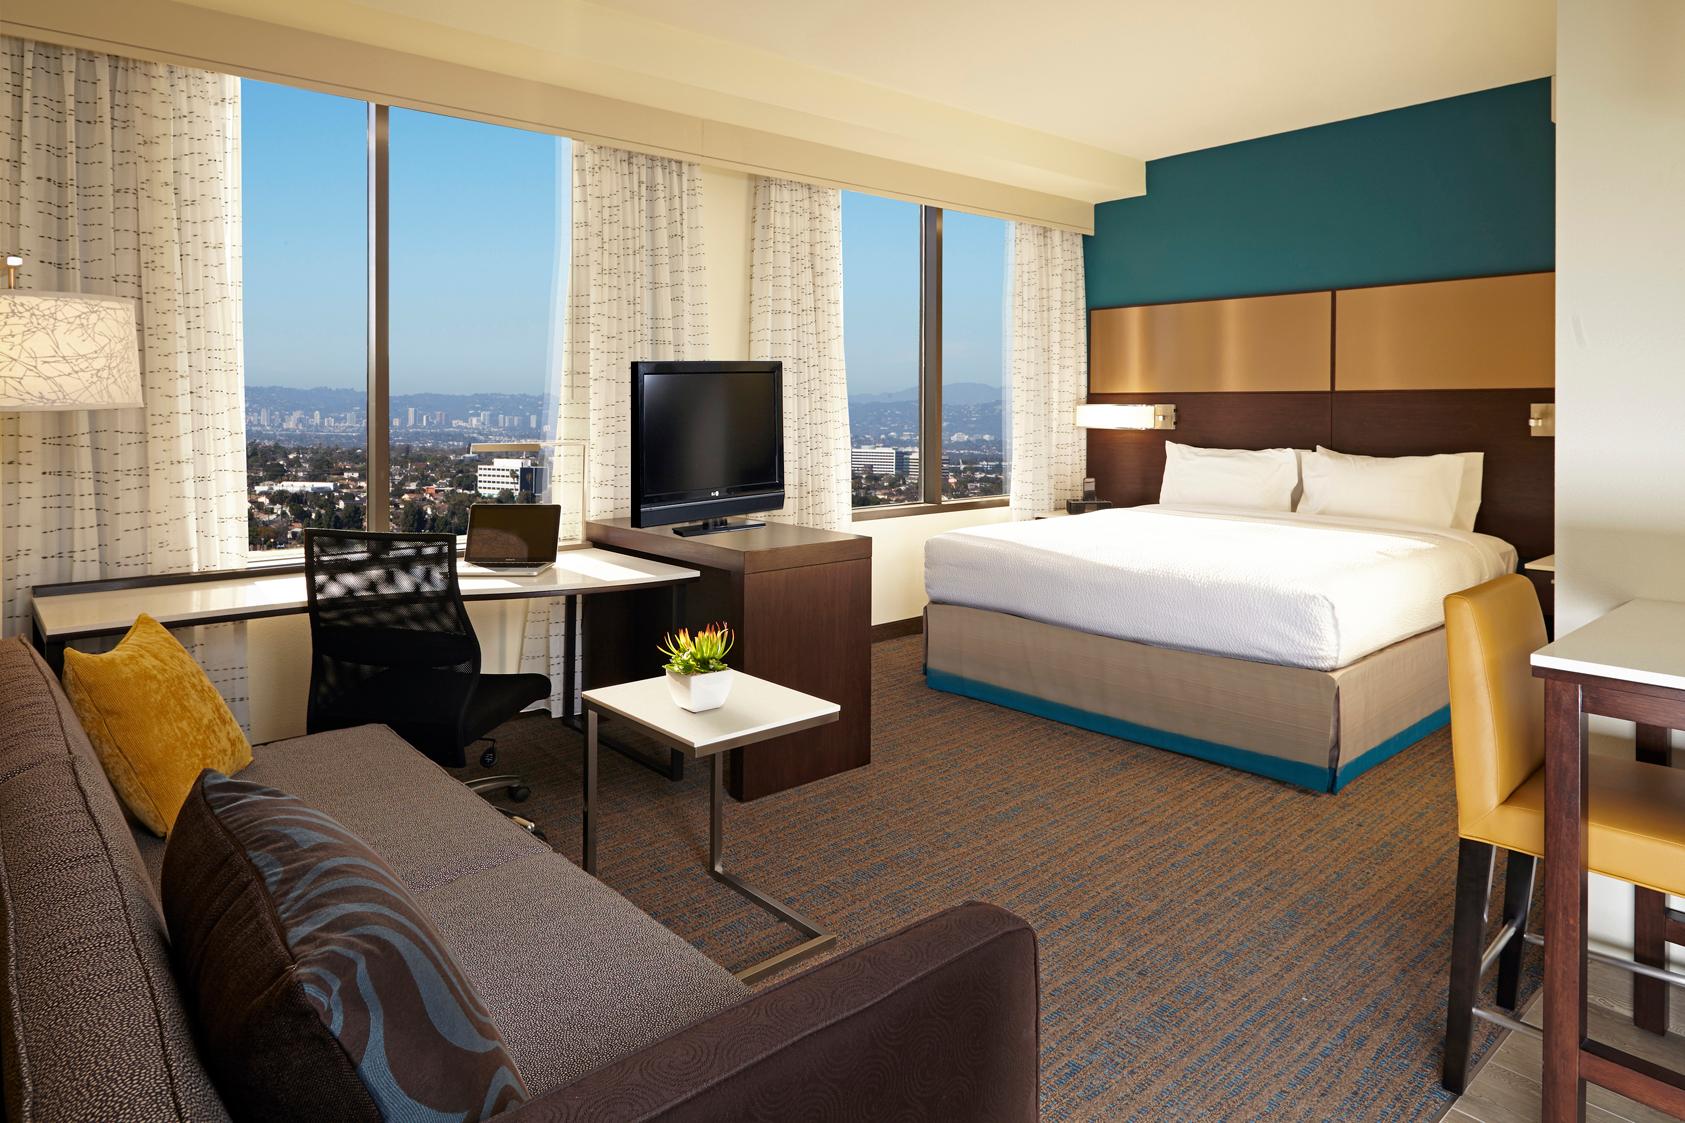 Residence Inn by Marriott Los Angeles LAX/Century Boulevard image 12